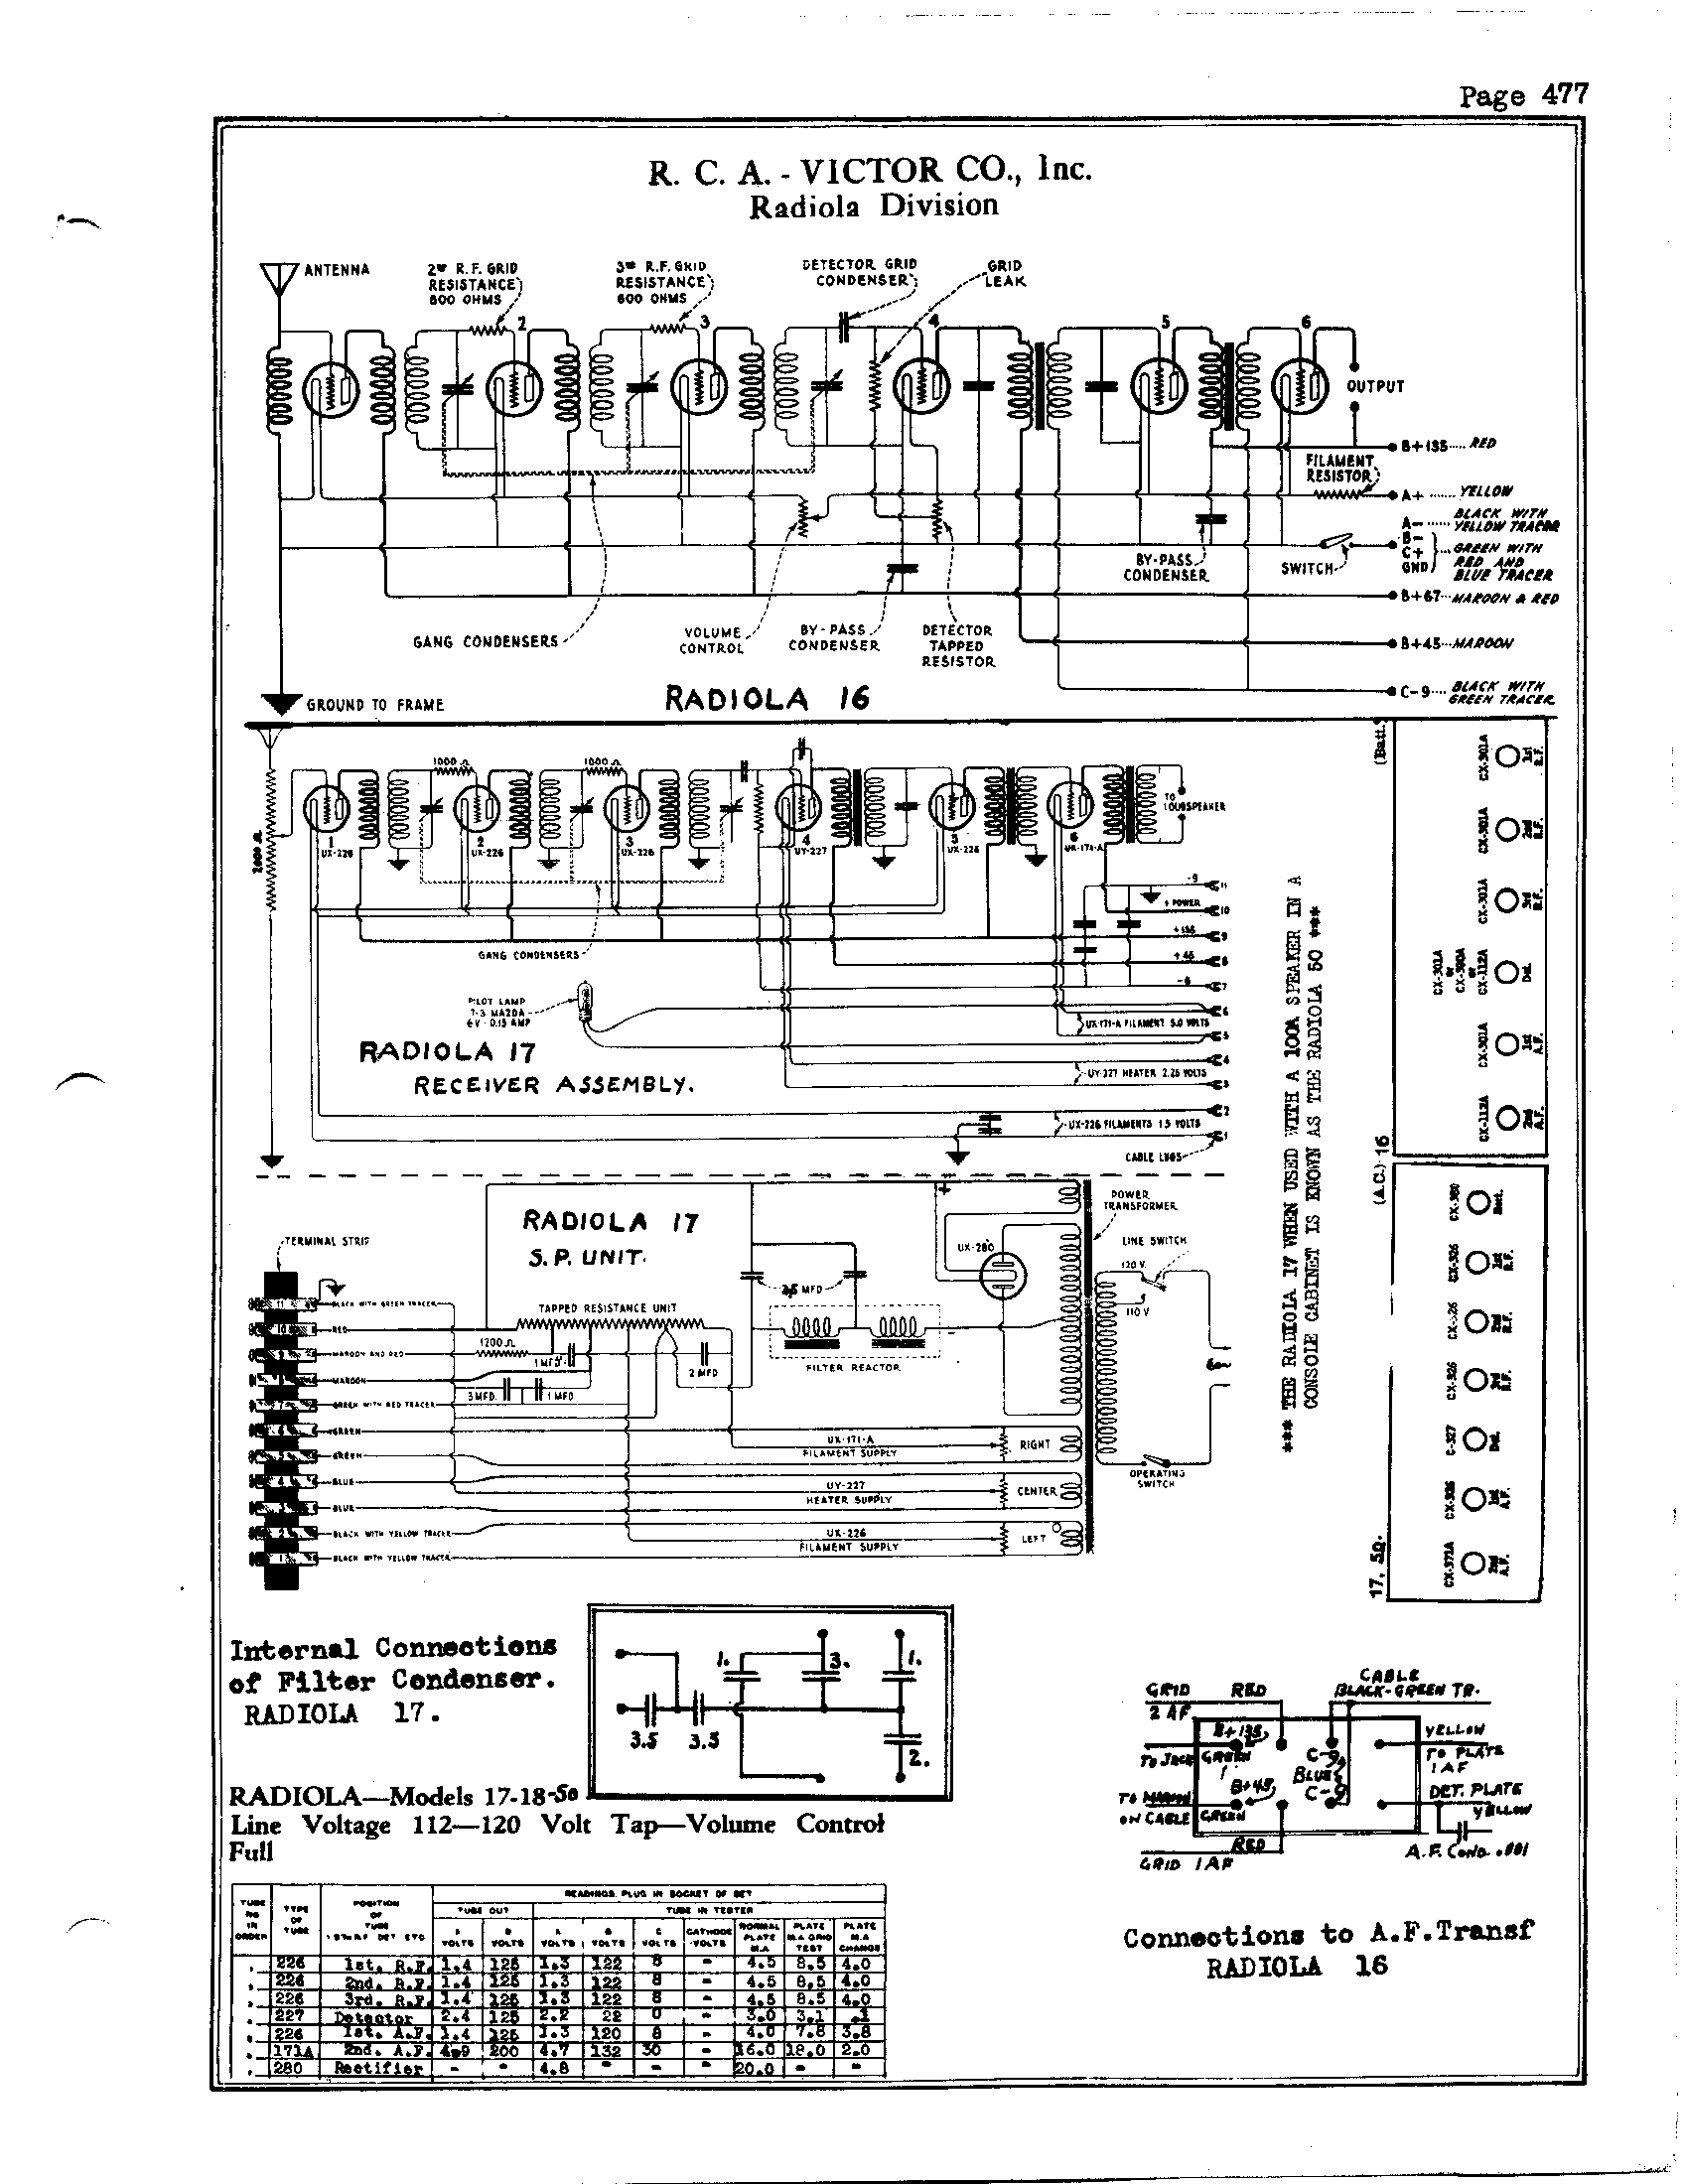 RCA Victor Co., Inc. Radiola 17 Schematic